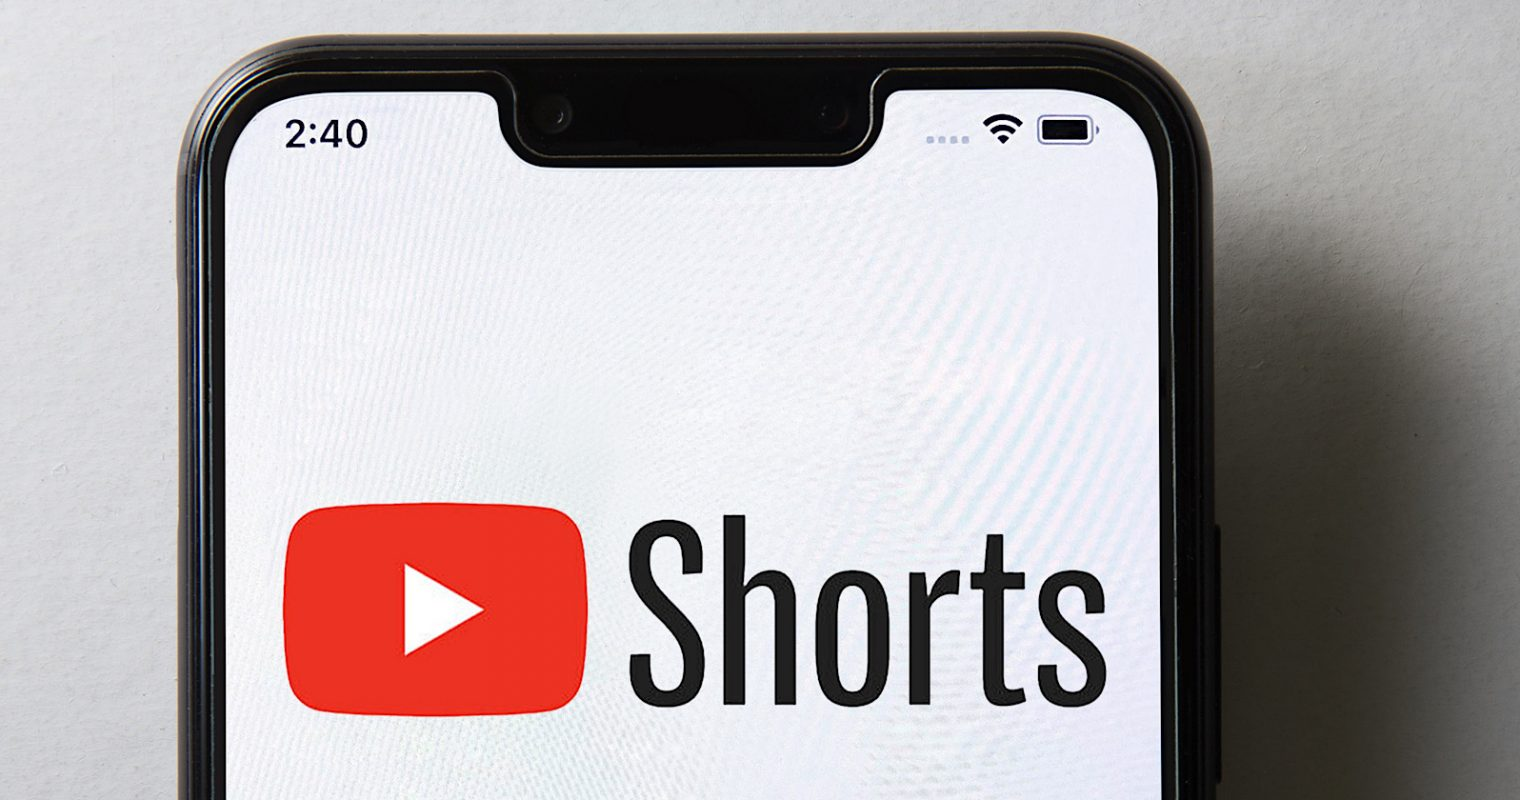 YouTube aprirà un fondo da 100 milioni di dollari per i creatori di cortometraggi